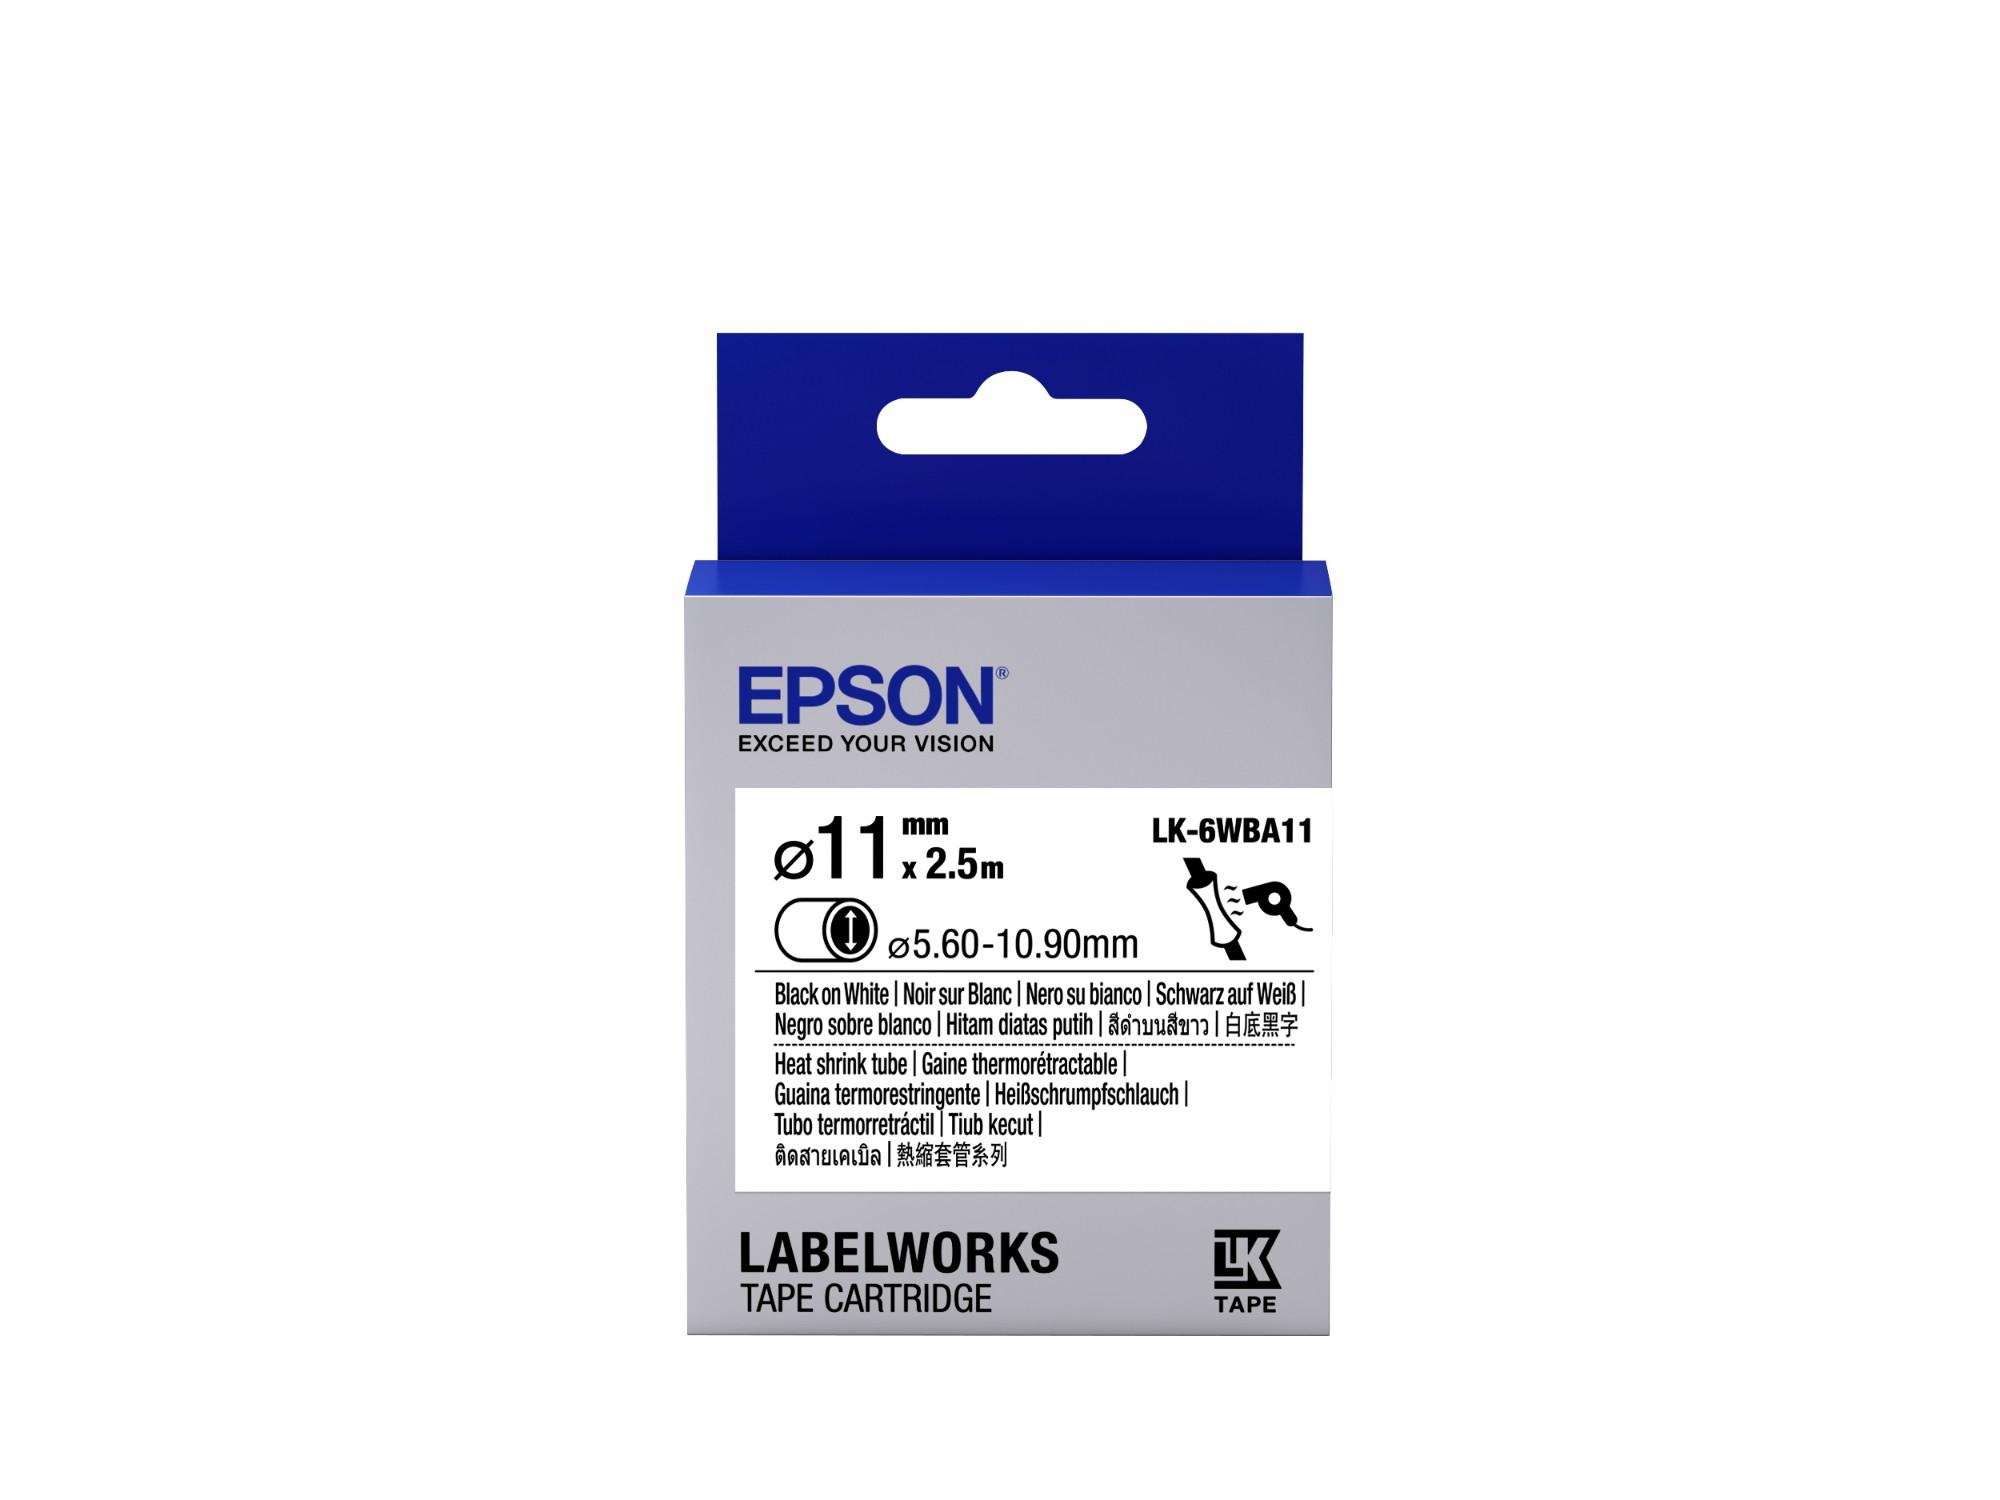 Epson Label Cartridge Heat Shrink Tube (HST) LK-6WBA11, zwart/wit D11 mm (2,5 m)